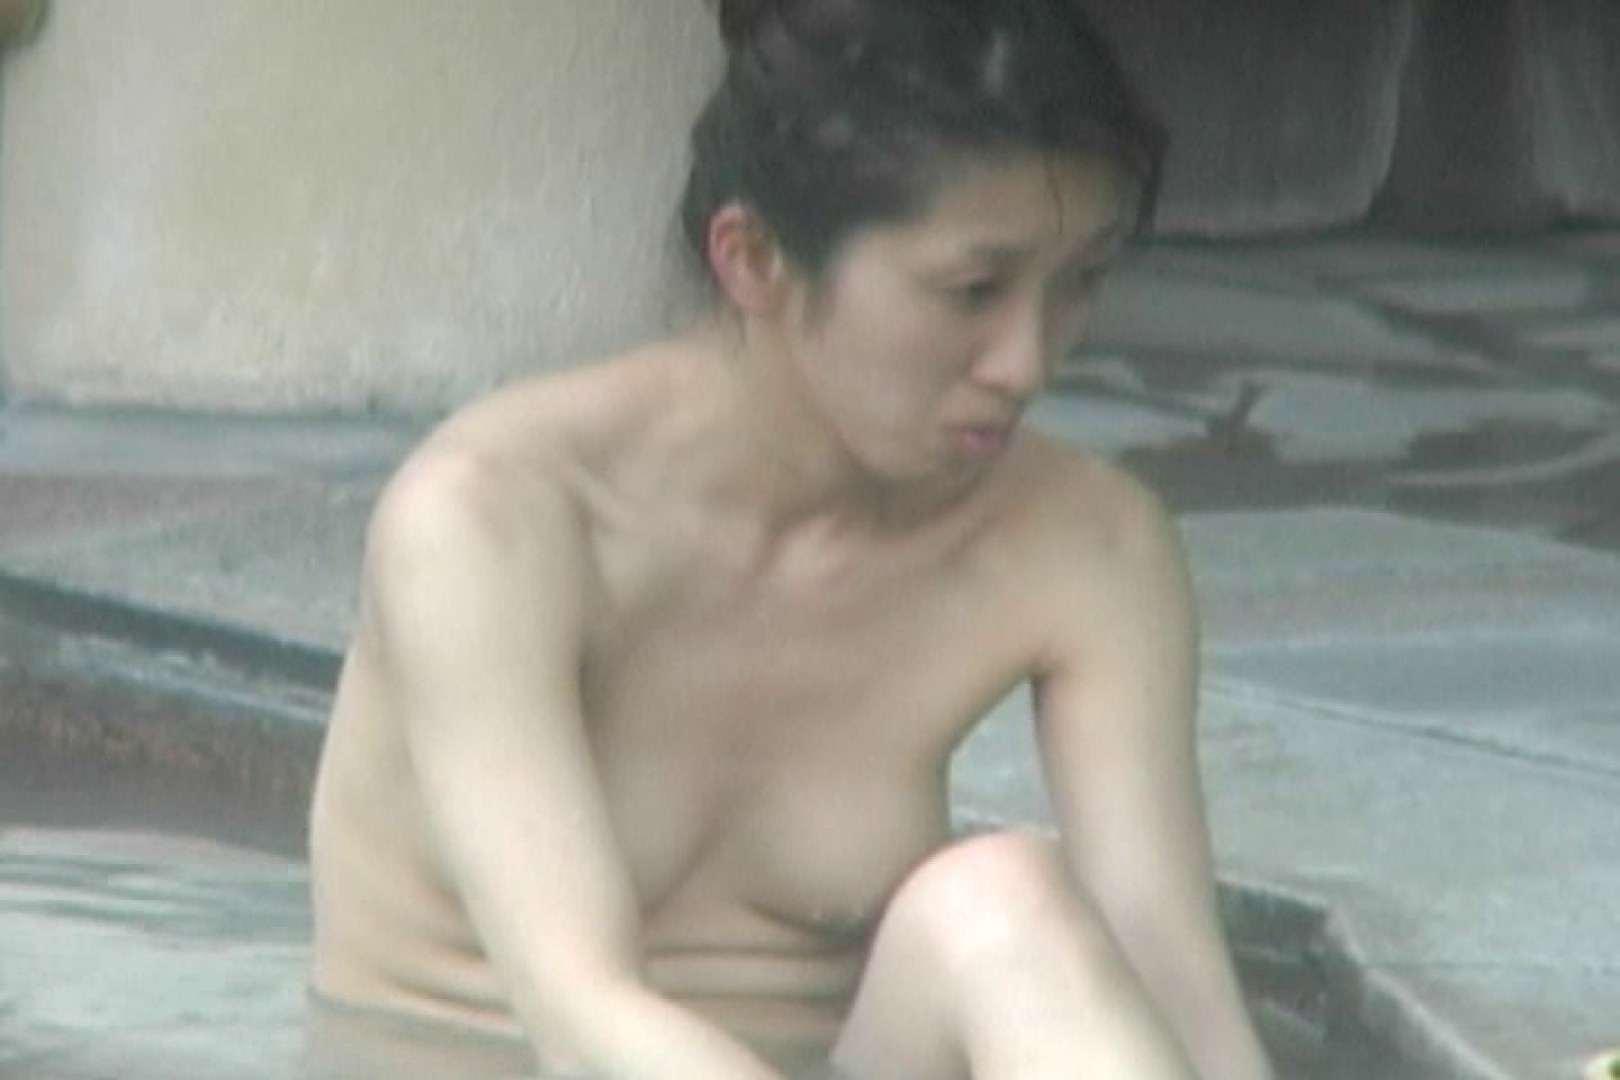 Aquaな露天風呂Vol.588 HなOL | 盗撮  66pic 12